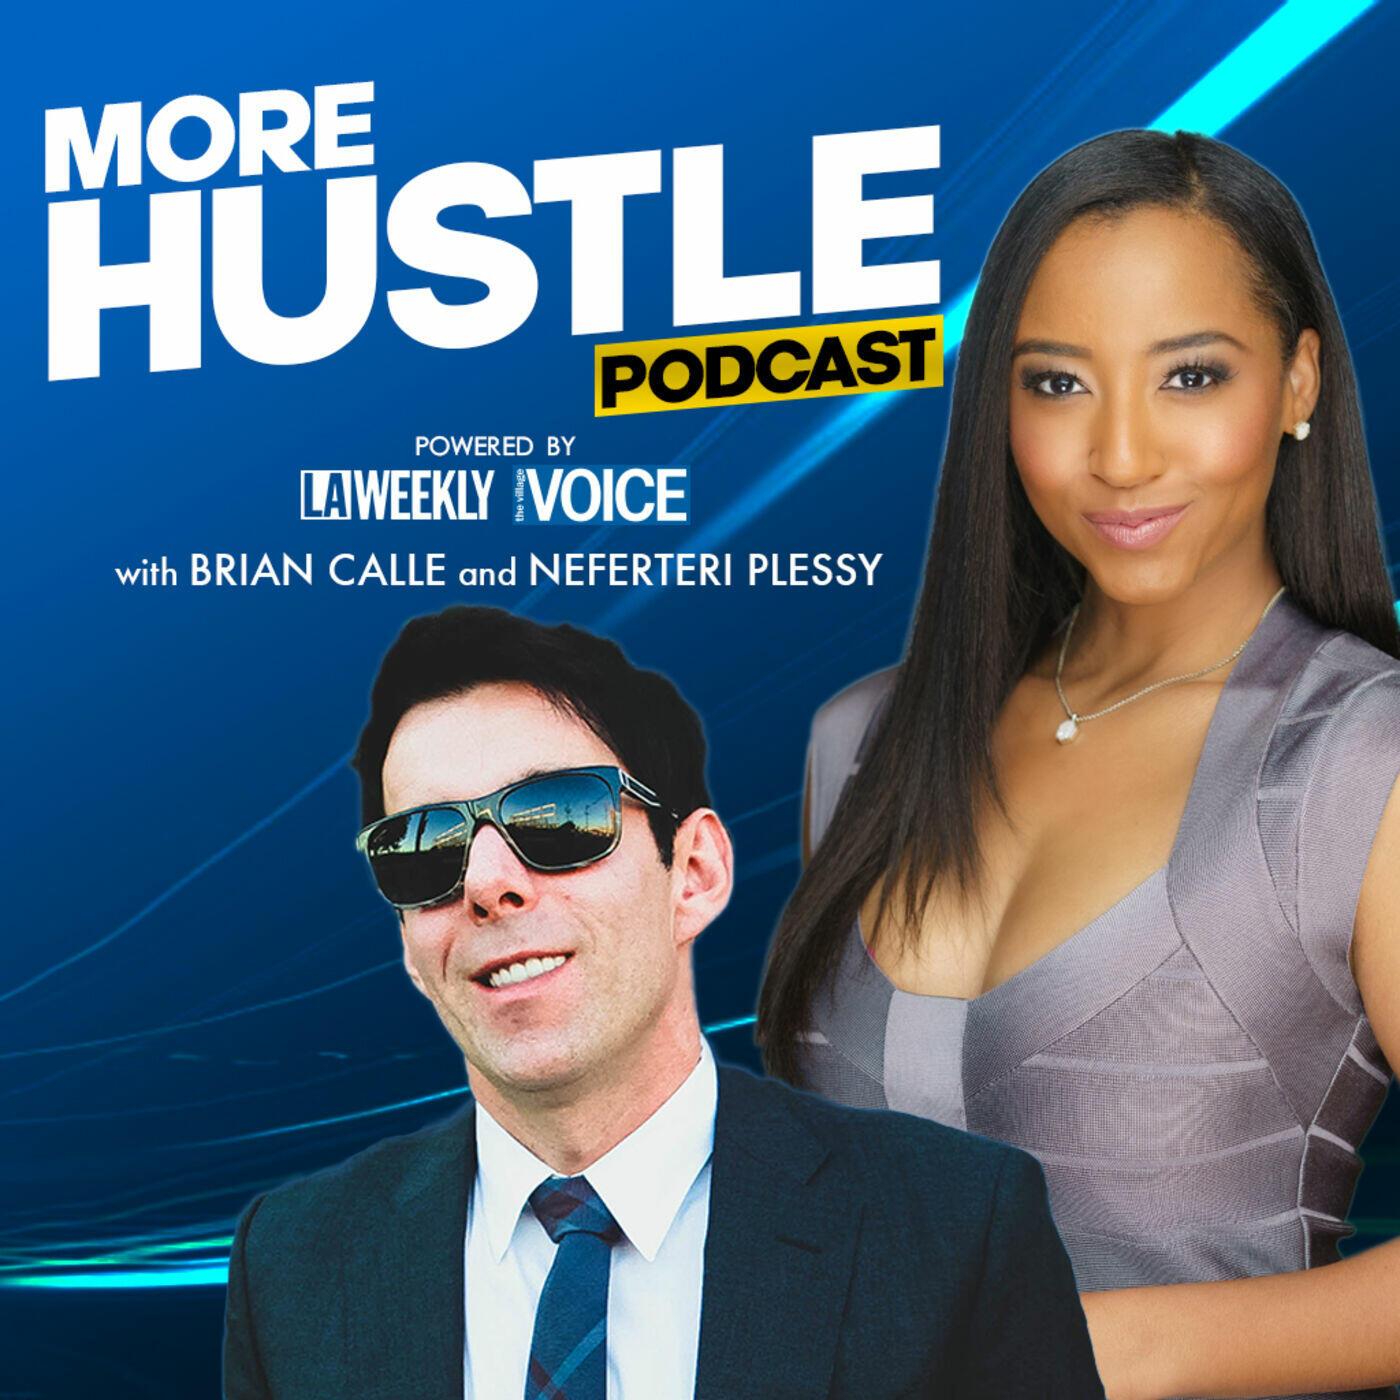 More Hustle